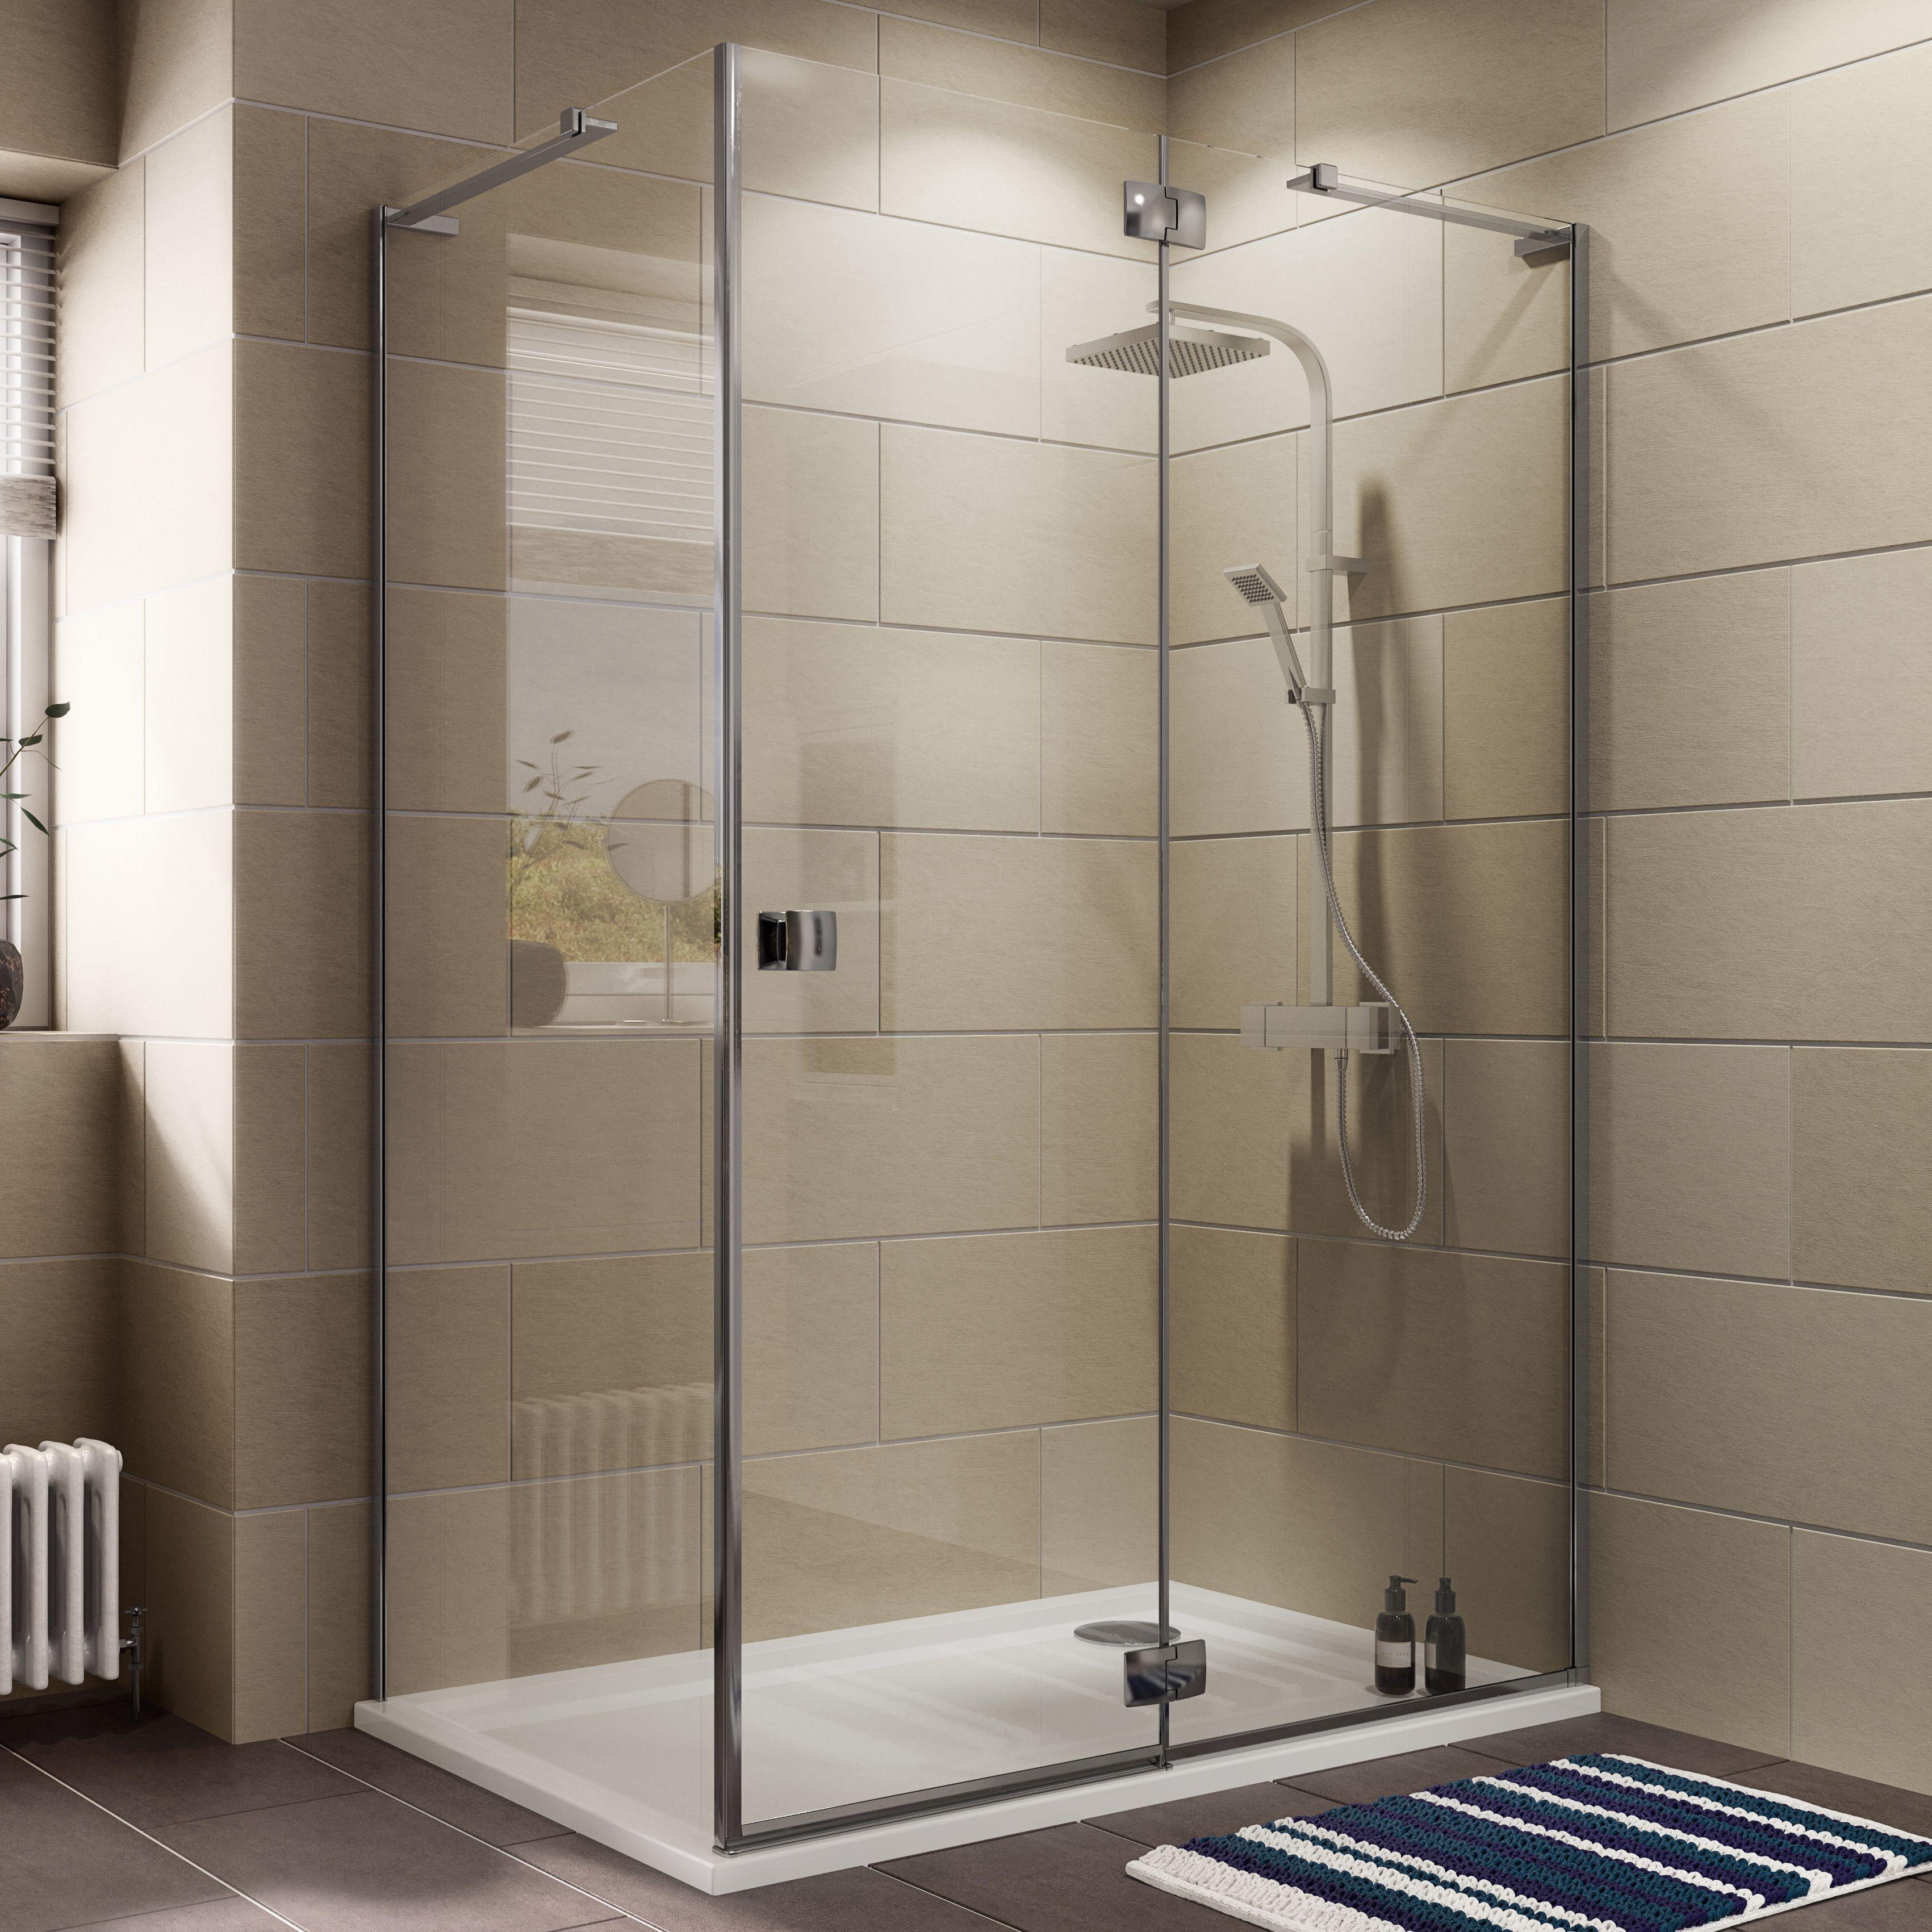 Cooke & Lewis Luxuriant Rectangular Shower Enclosure, Tray & Waste ...